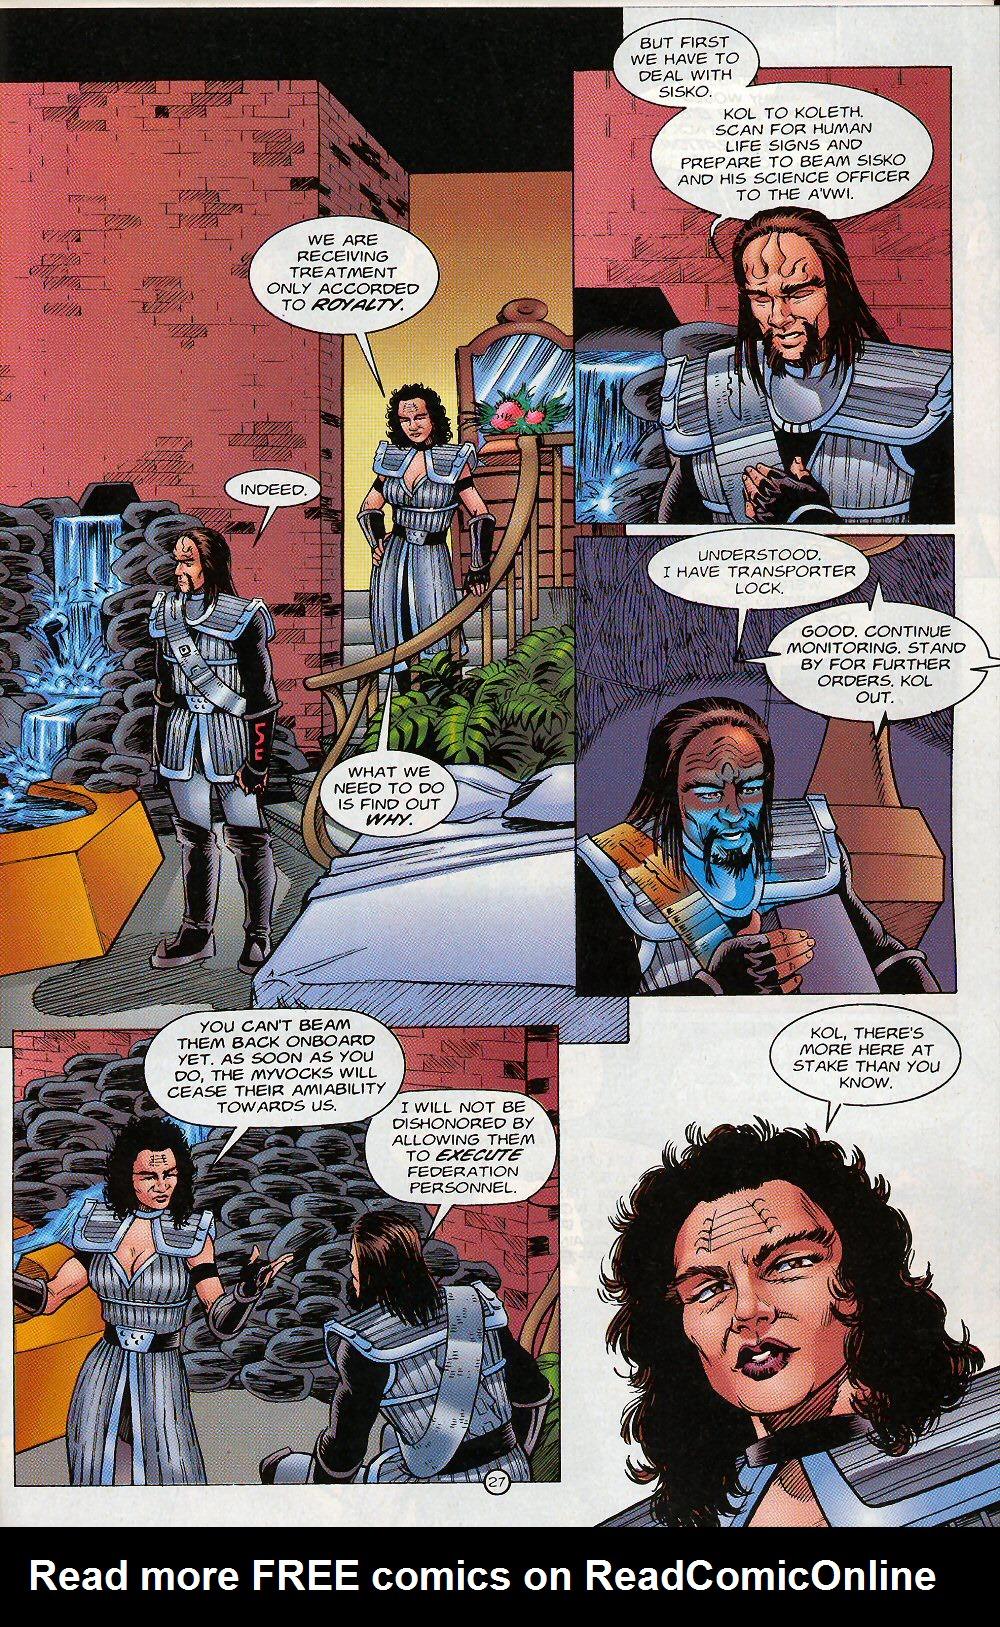 Read online Star Trek: Deep Space Nine - Lightstorm comic -  Issue # Full - 27